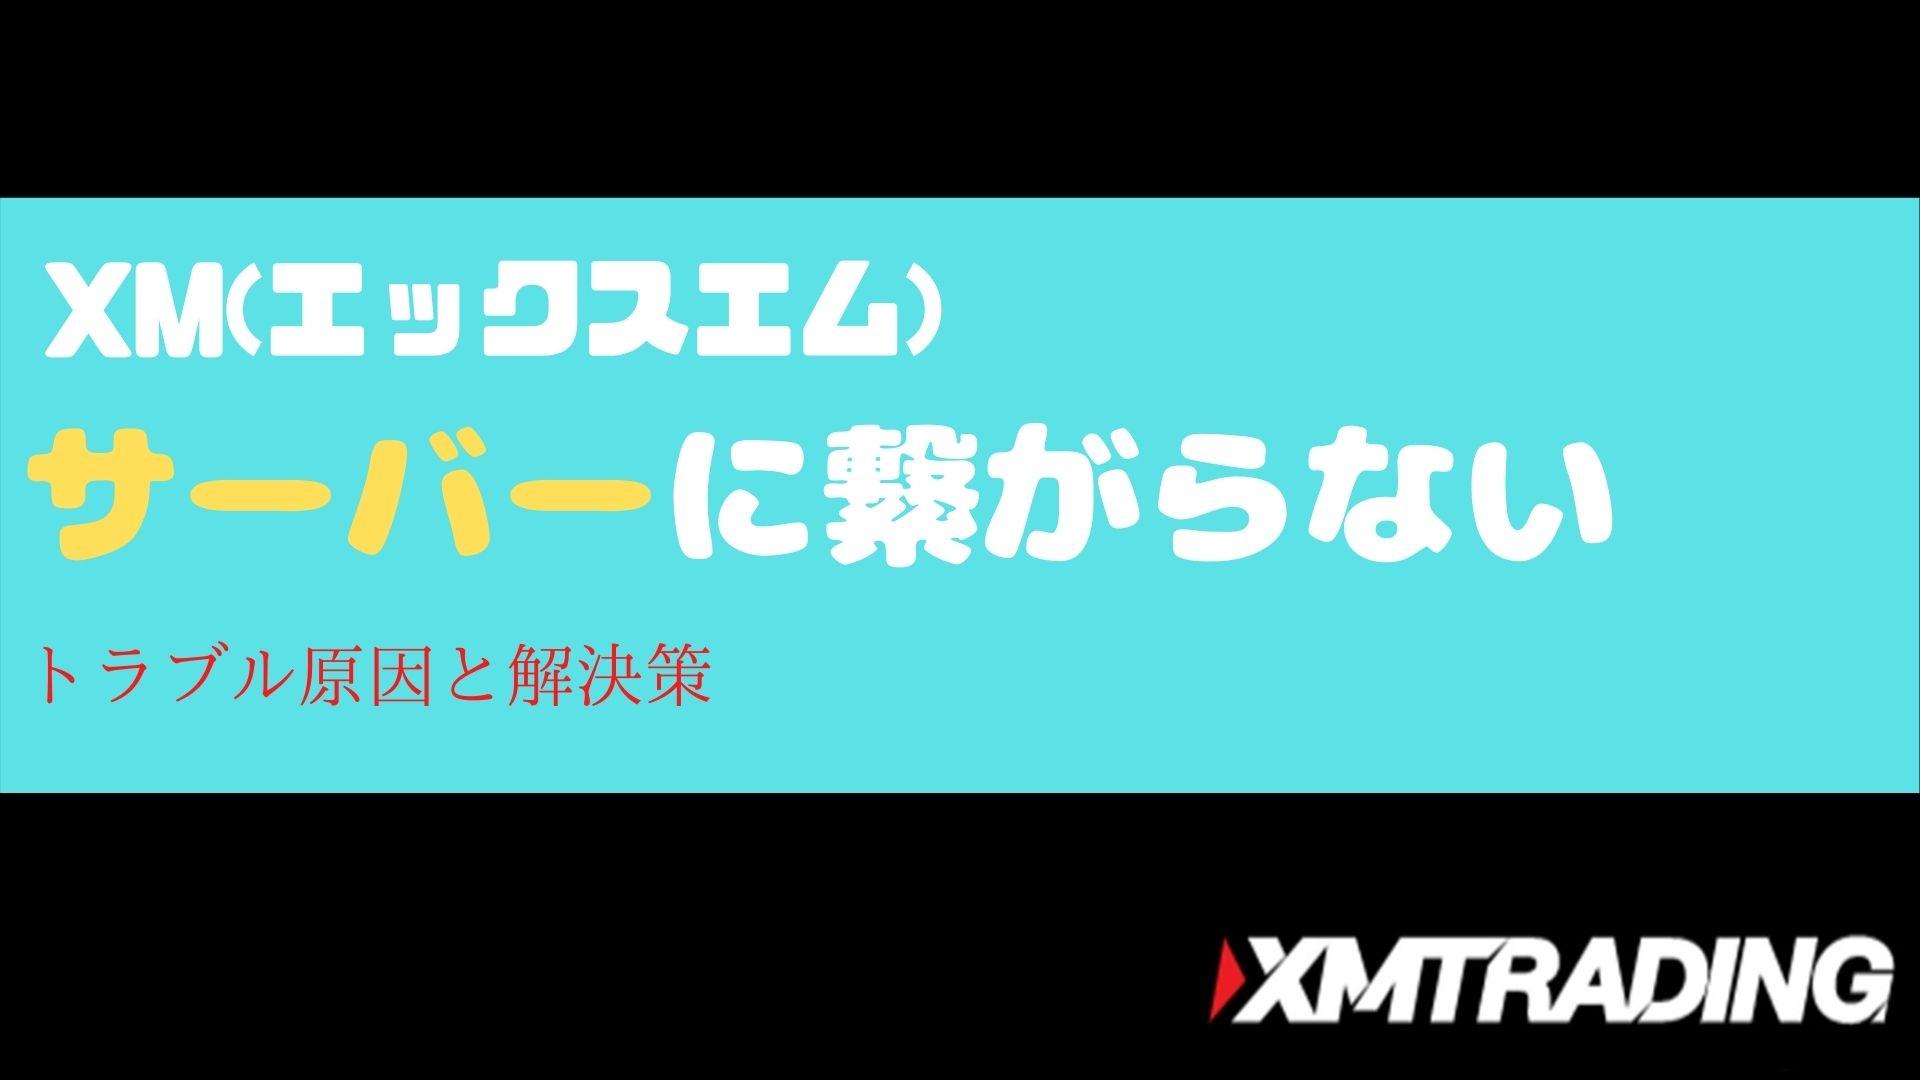 xm-server-title